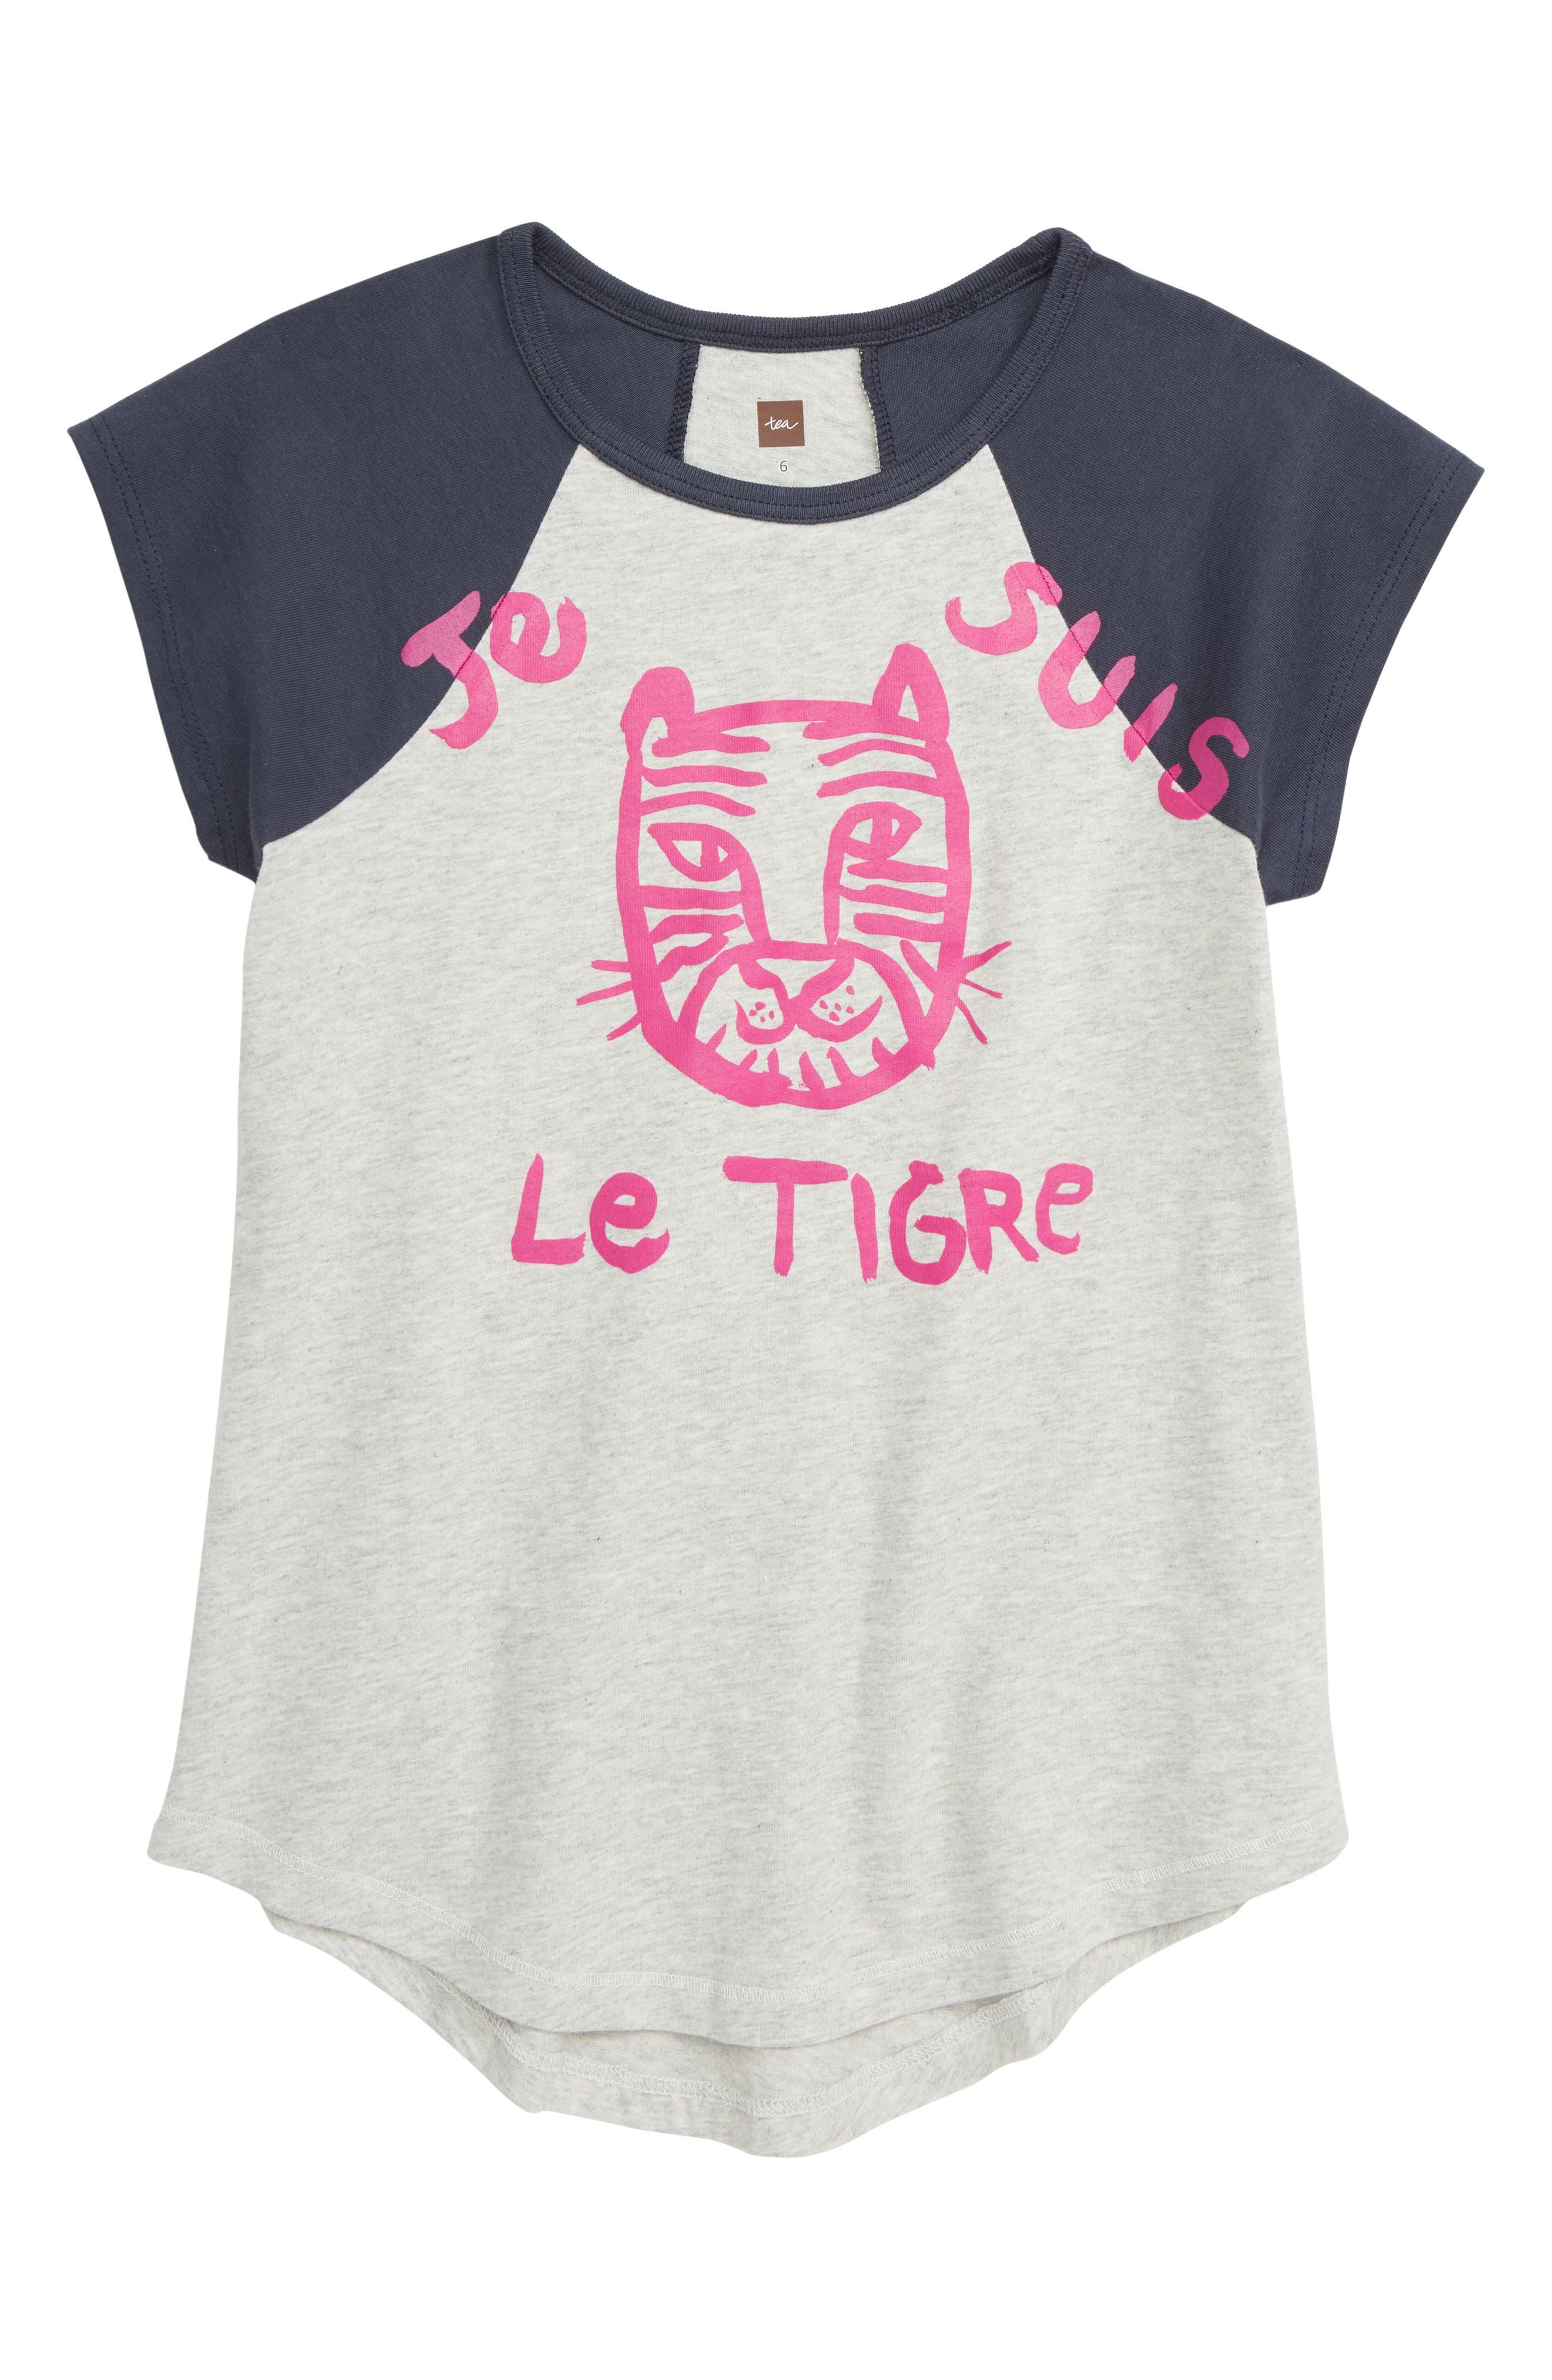 Le Tigre Raglan Tunic,                             Main thumbnail 1, color,                             LIGHT GREY HEATHER